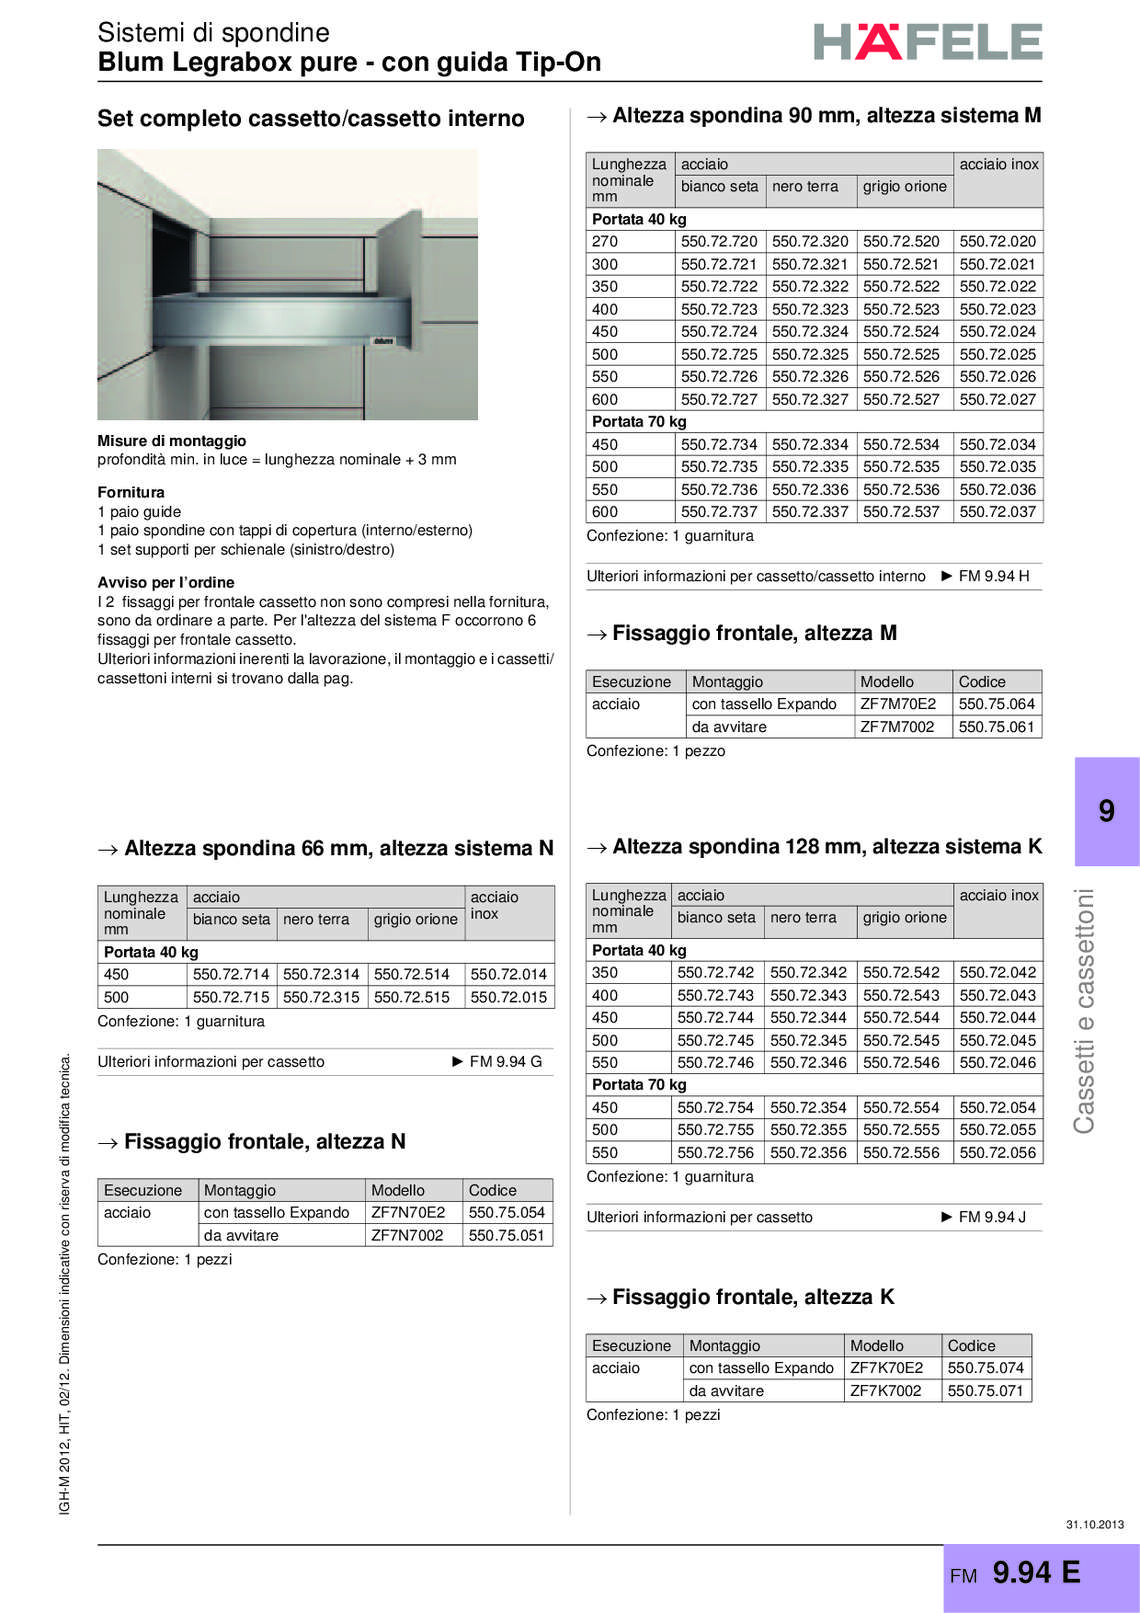 hafele-spondine-e-guide-per-mobili_40_122.jpg